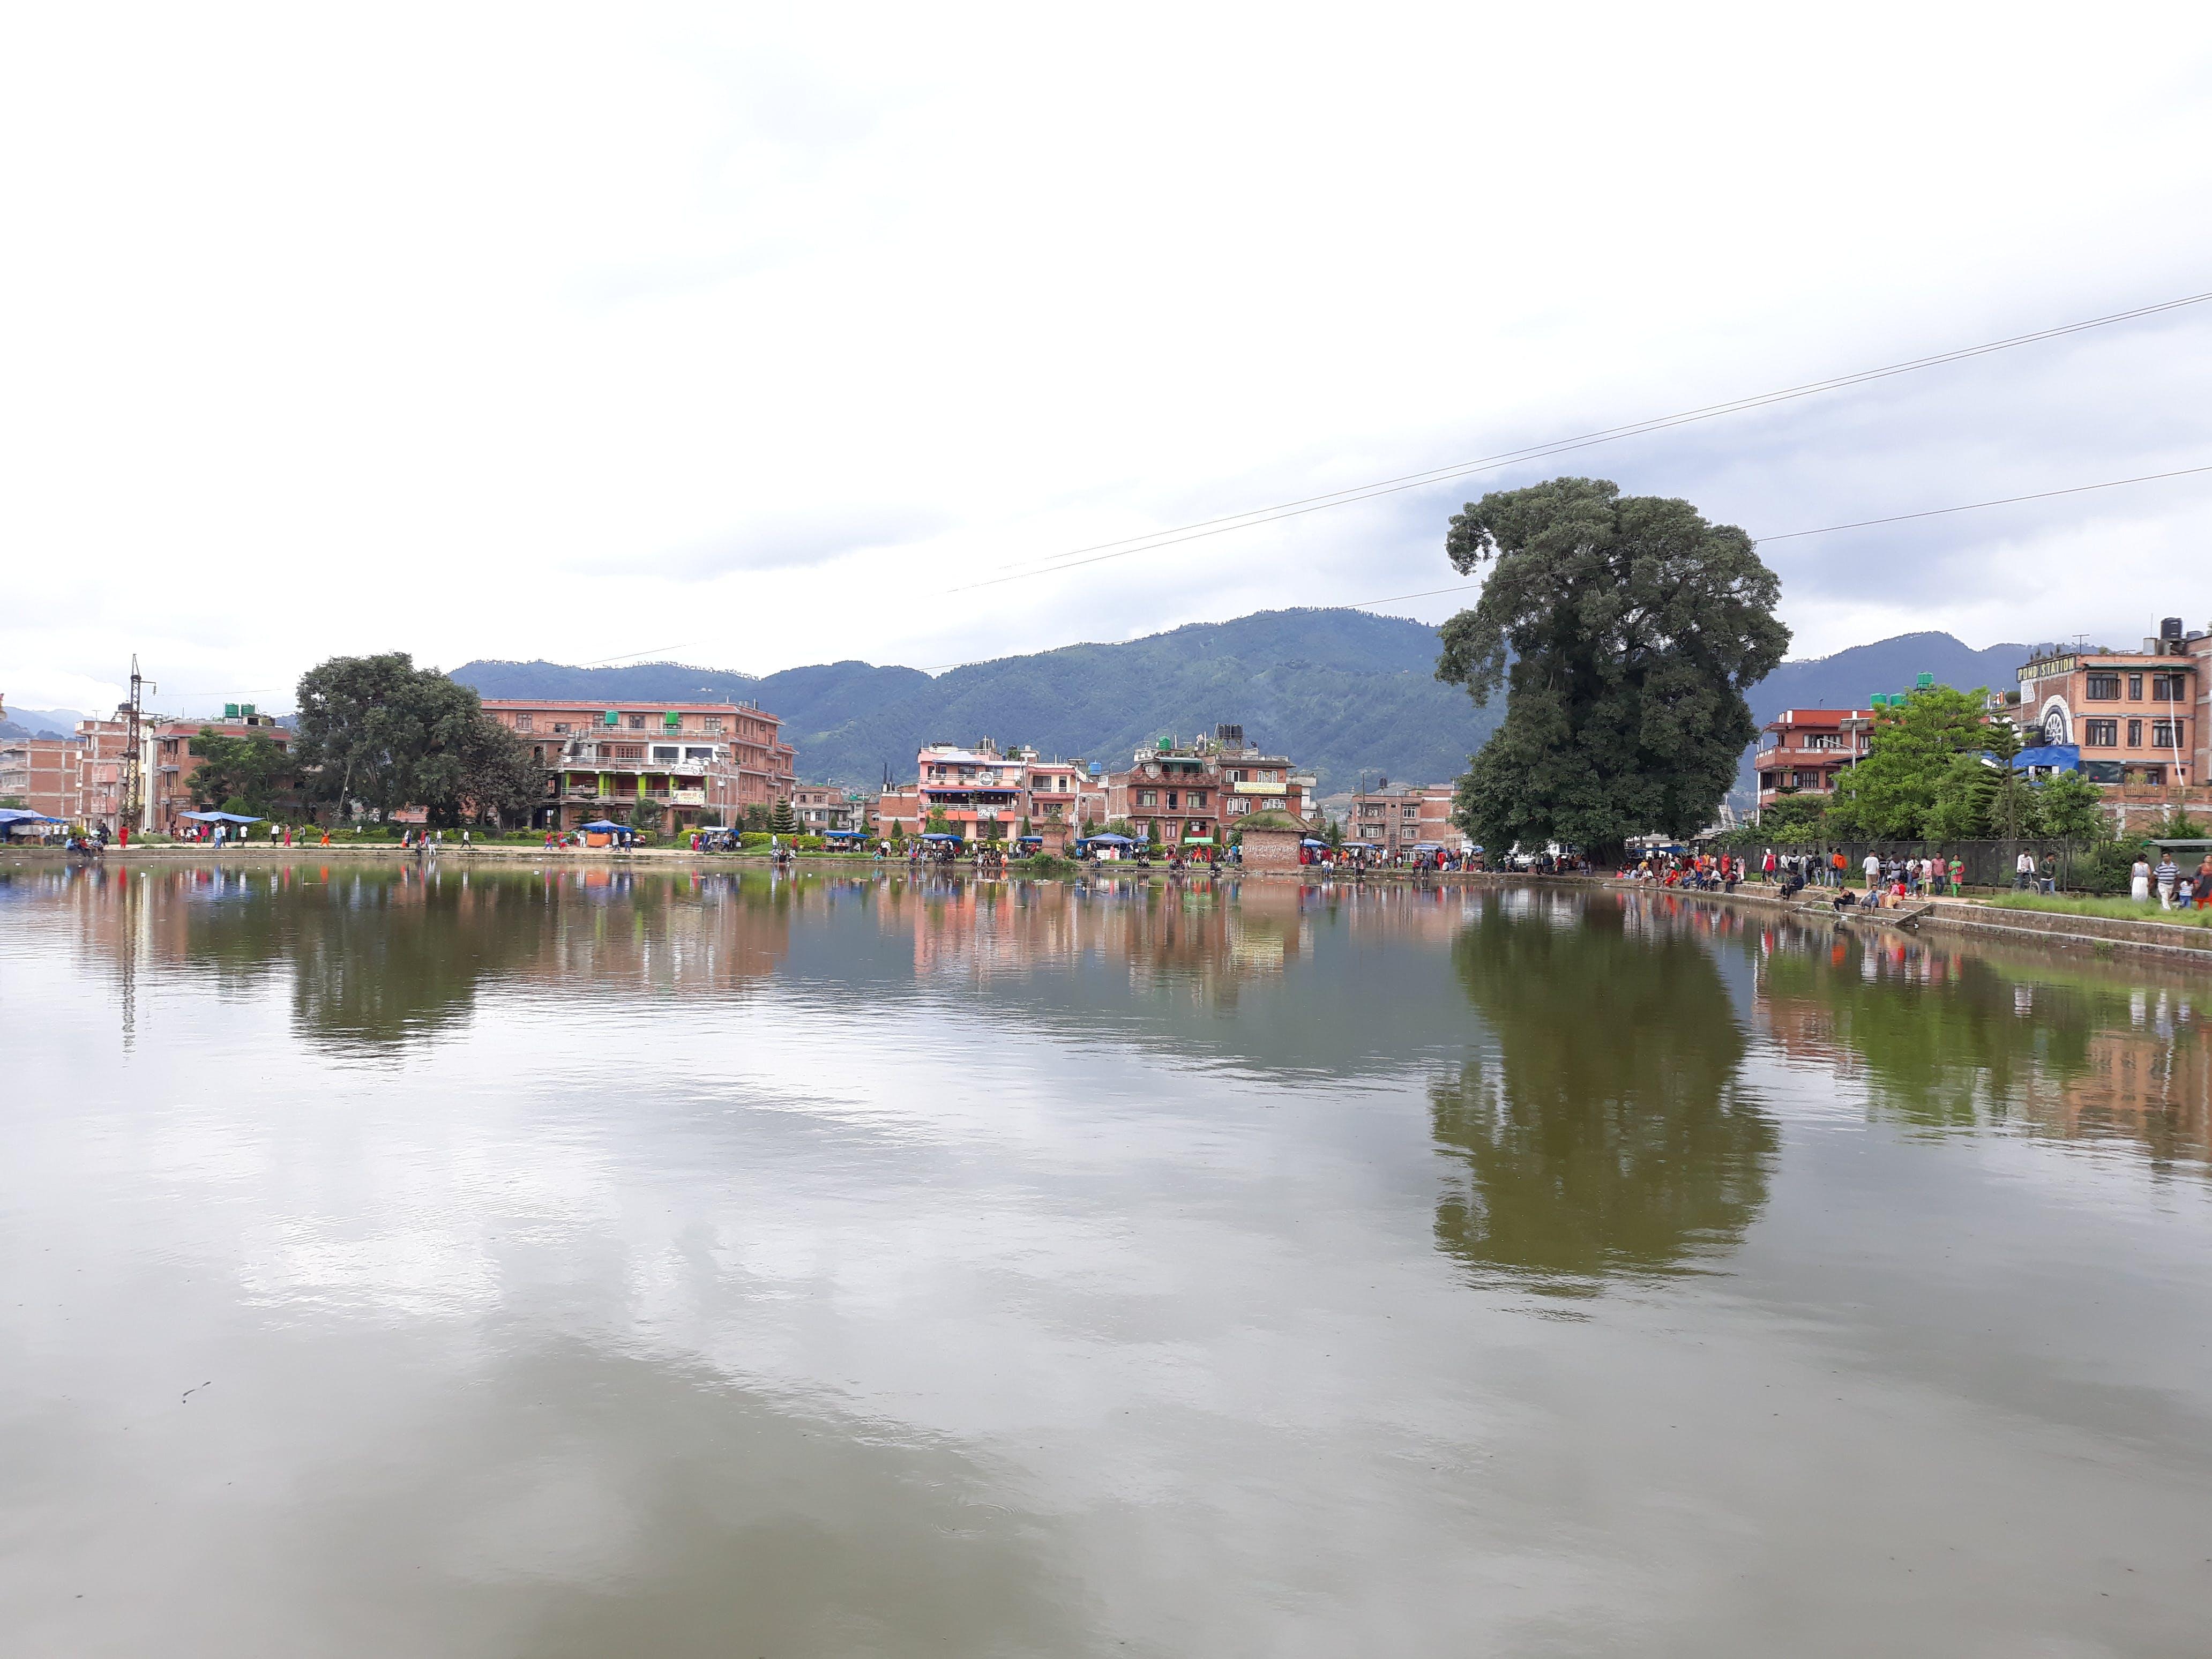 Free stock photo of Bhadgaon, bhaktapur, Kamalpokhari, khwopa